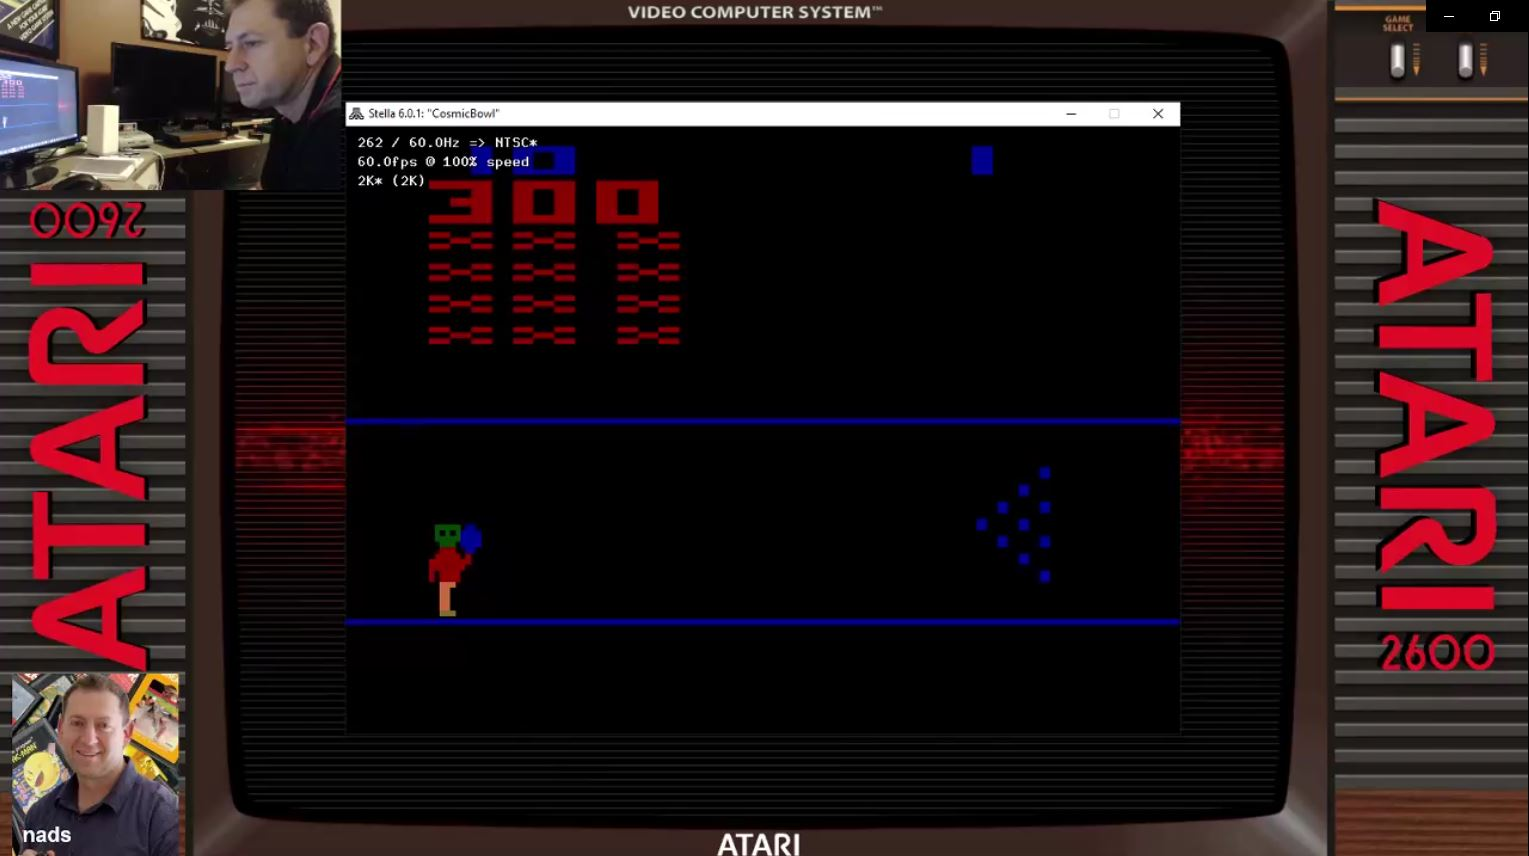 nads: Cosmic Bowling (Atari 2600 Emulated Novice/B Mode) 300 points on 2021-02-02 04:32:30